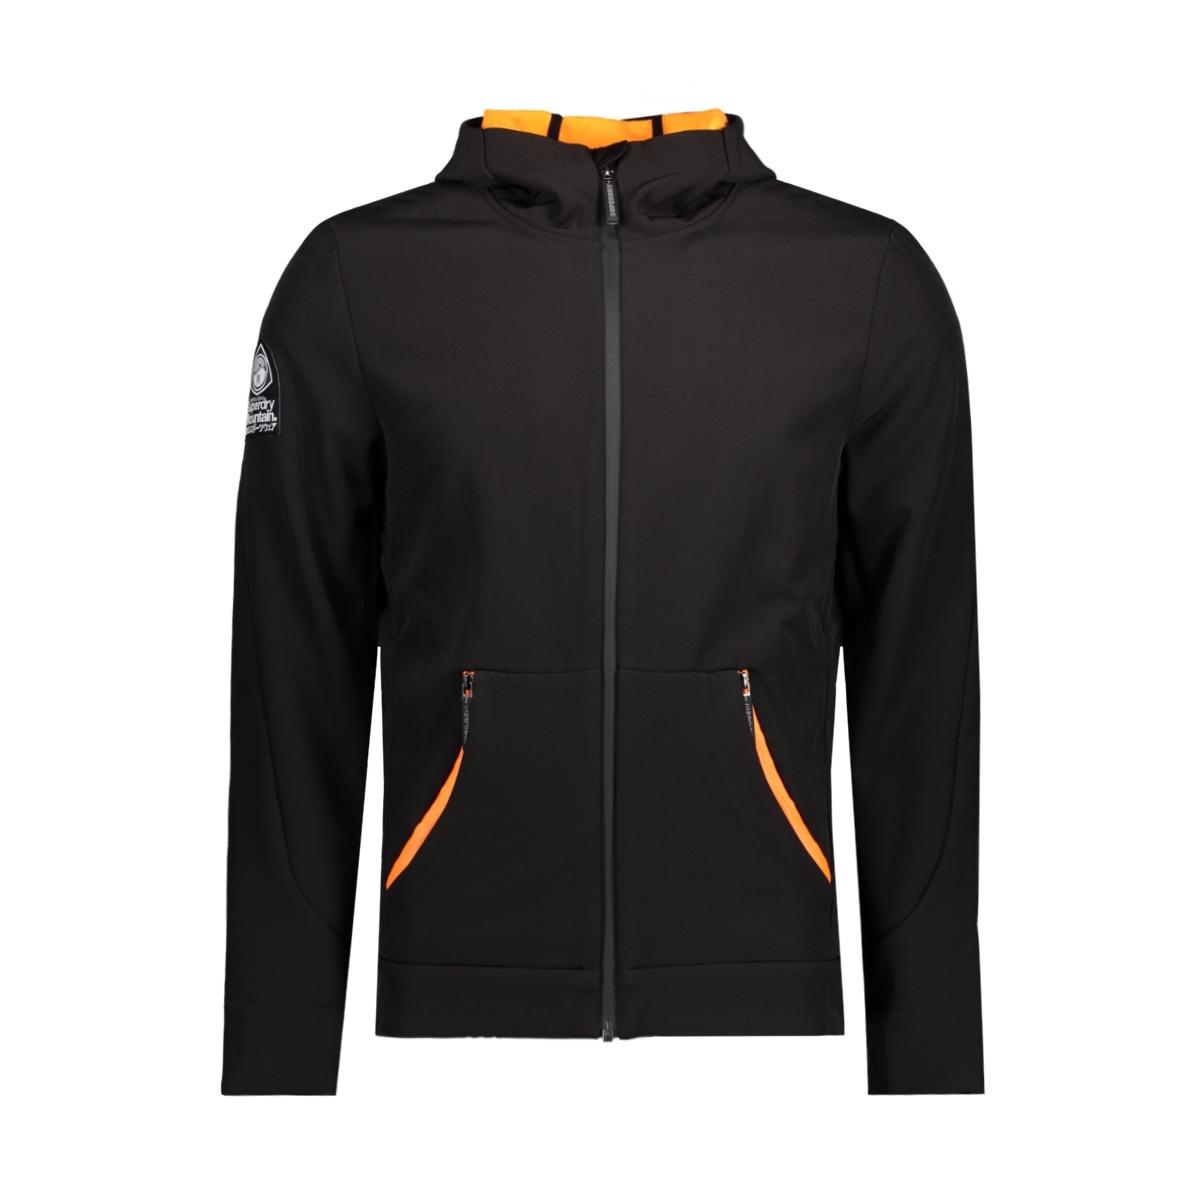 m50002lp mountaineer softshell superdry jas 43a black orange